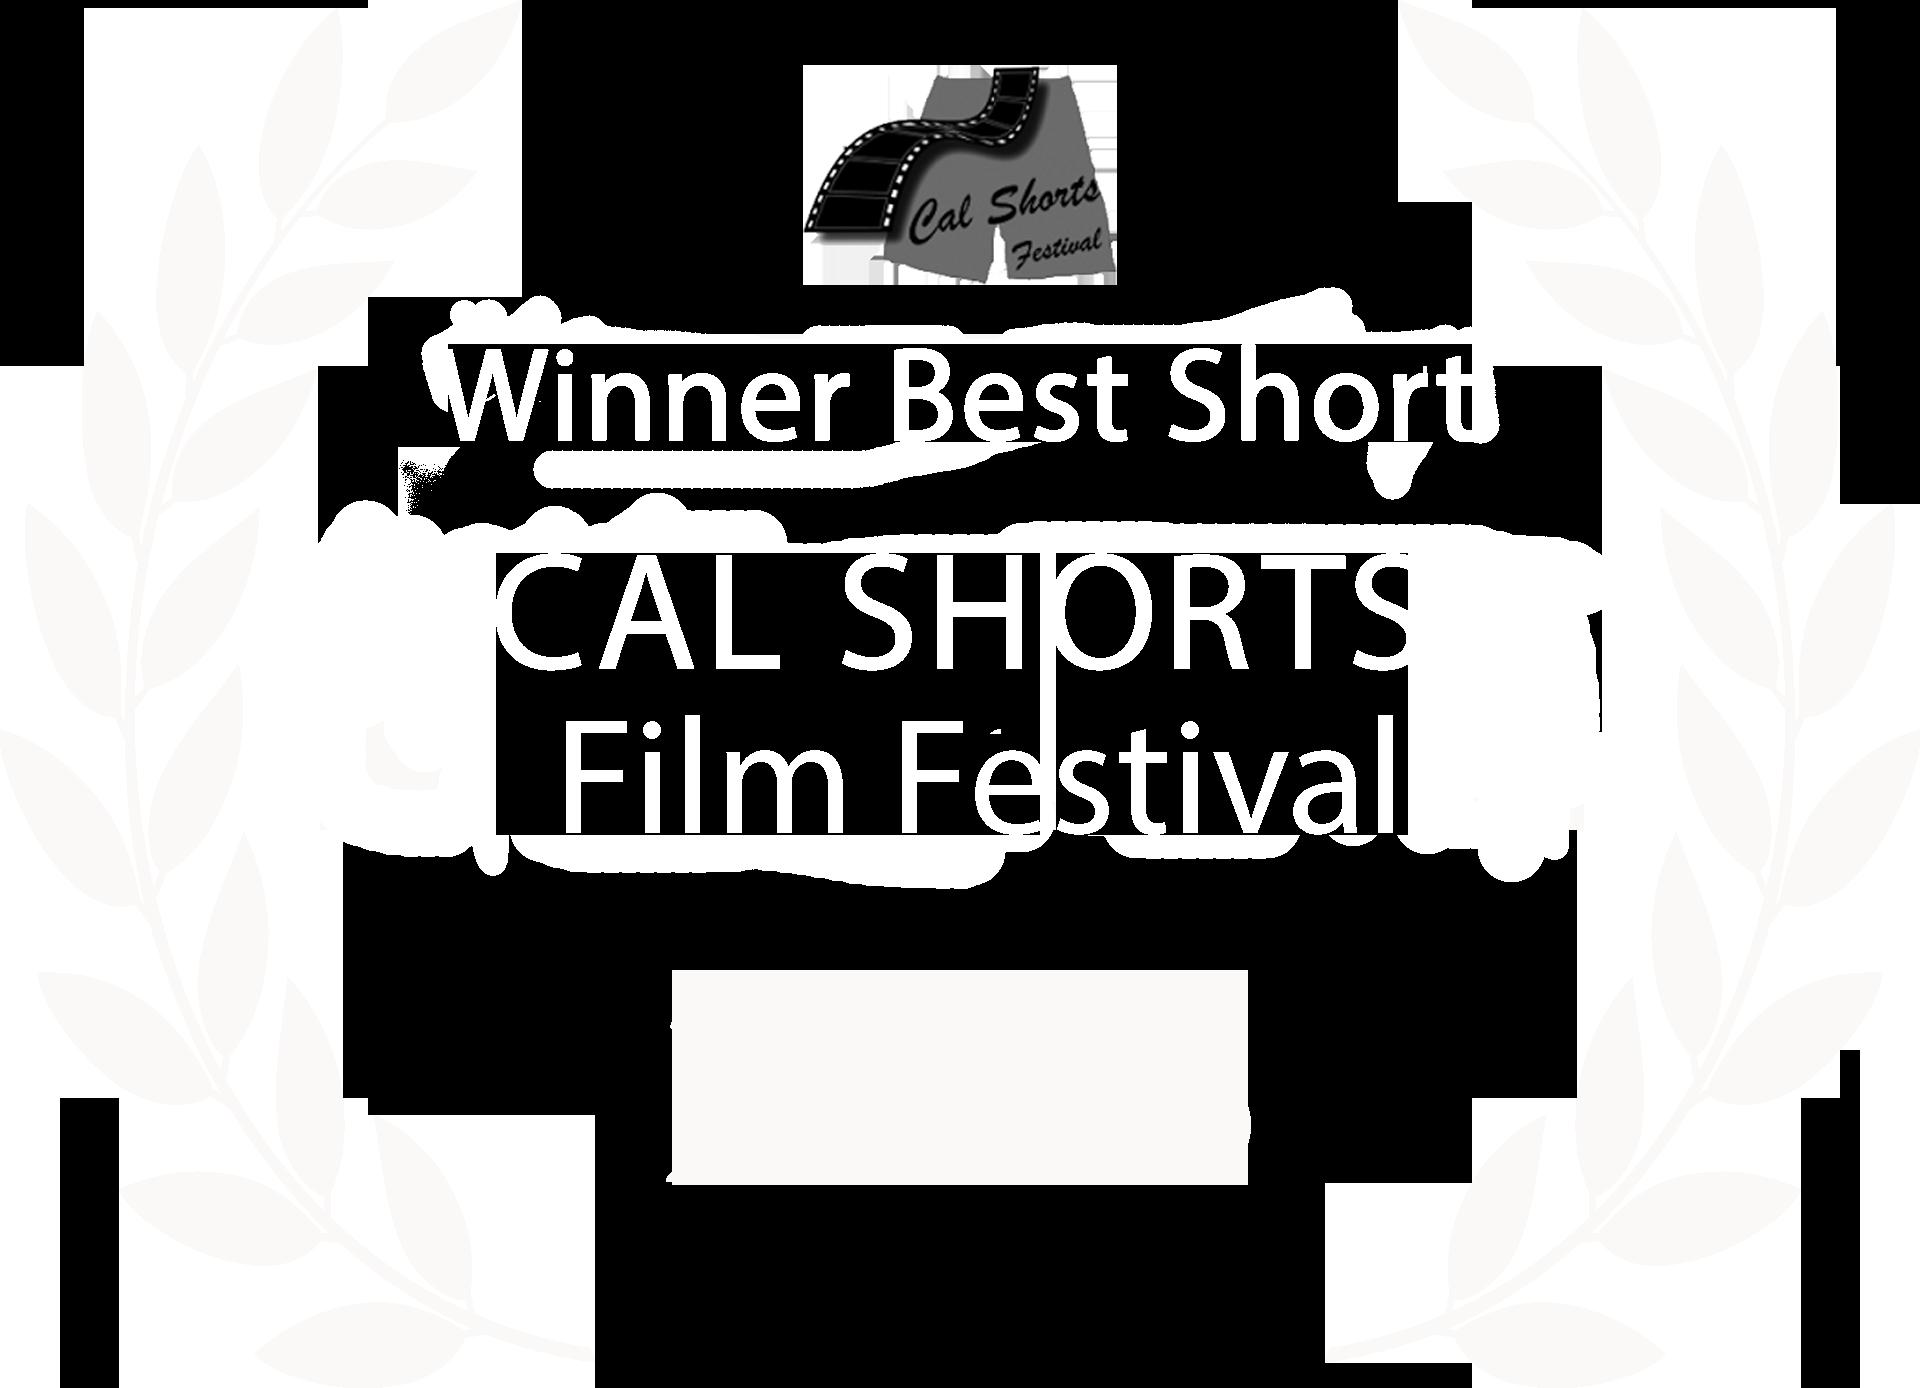 cal shorts FF transparent background winner best short.png